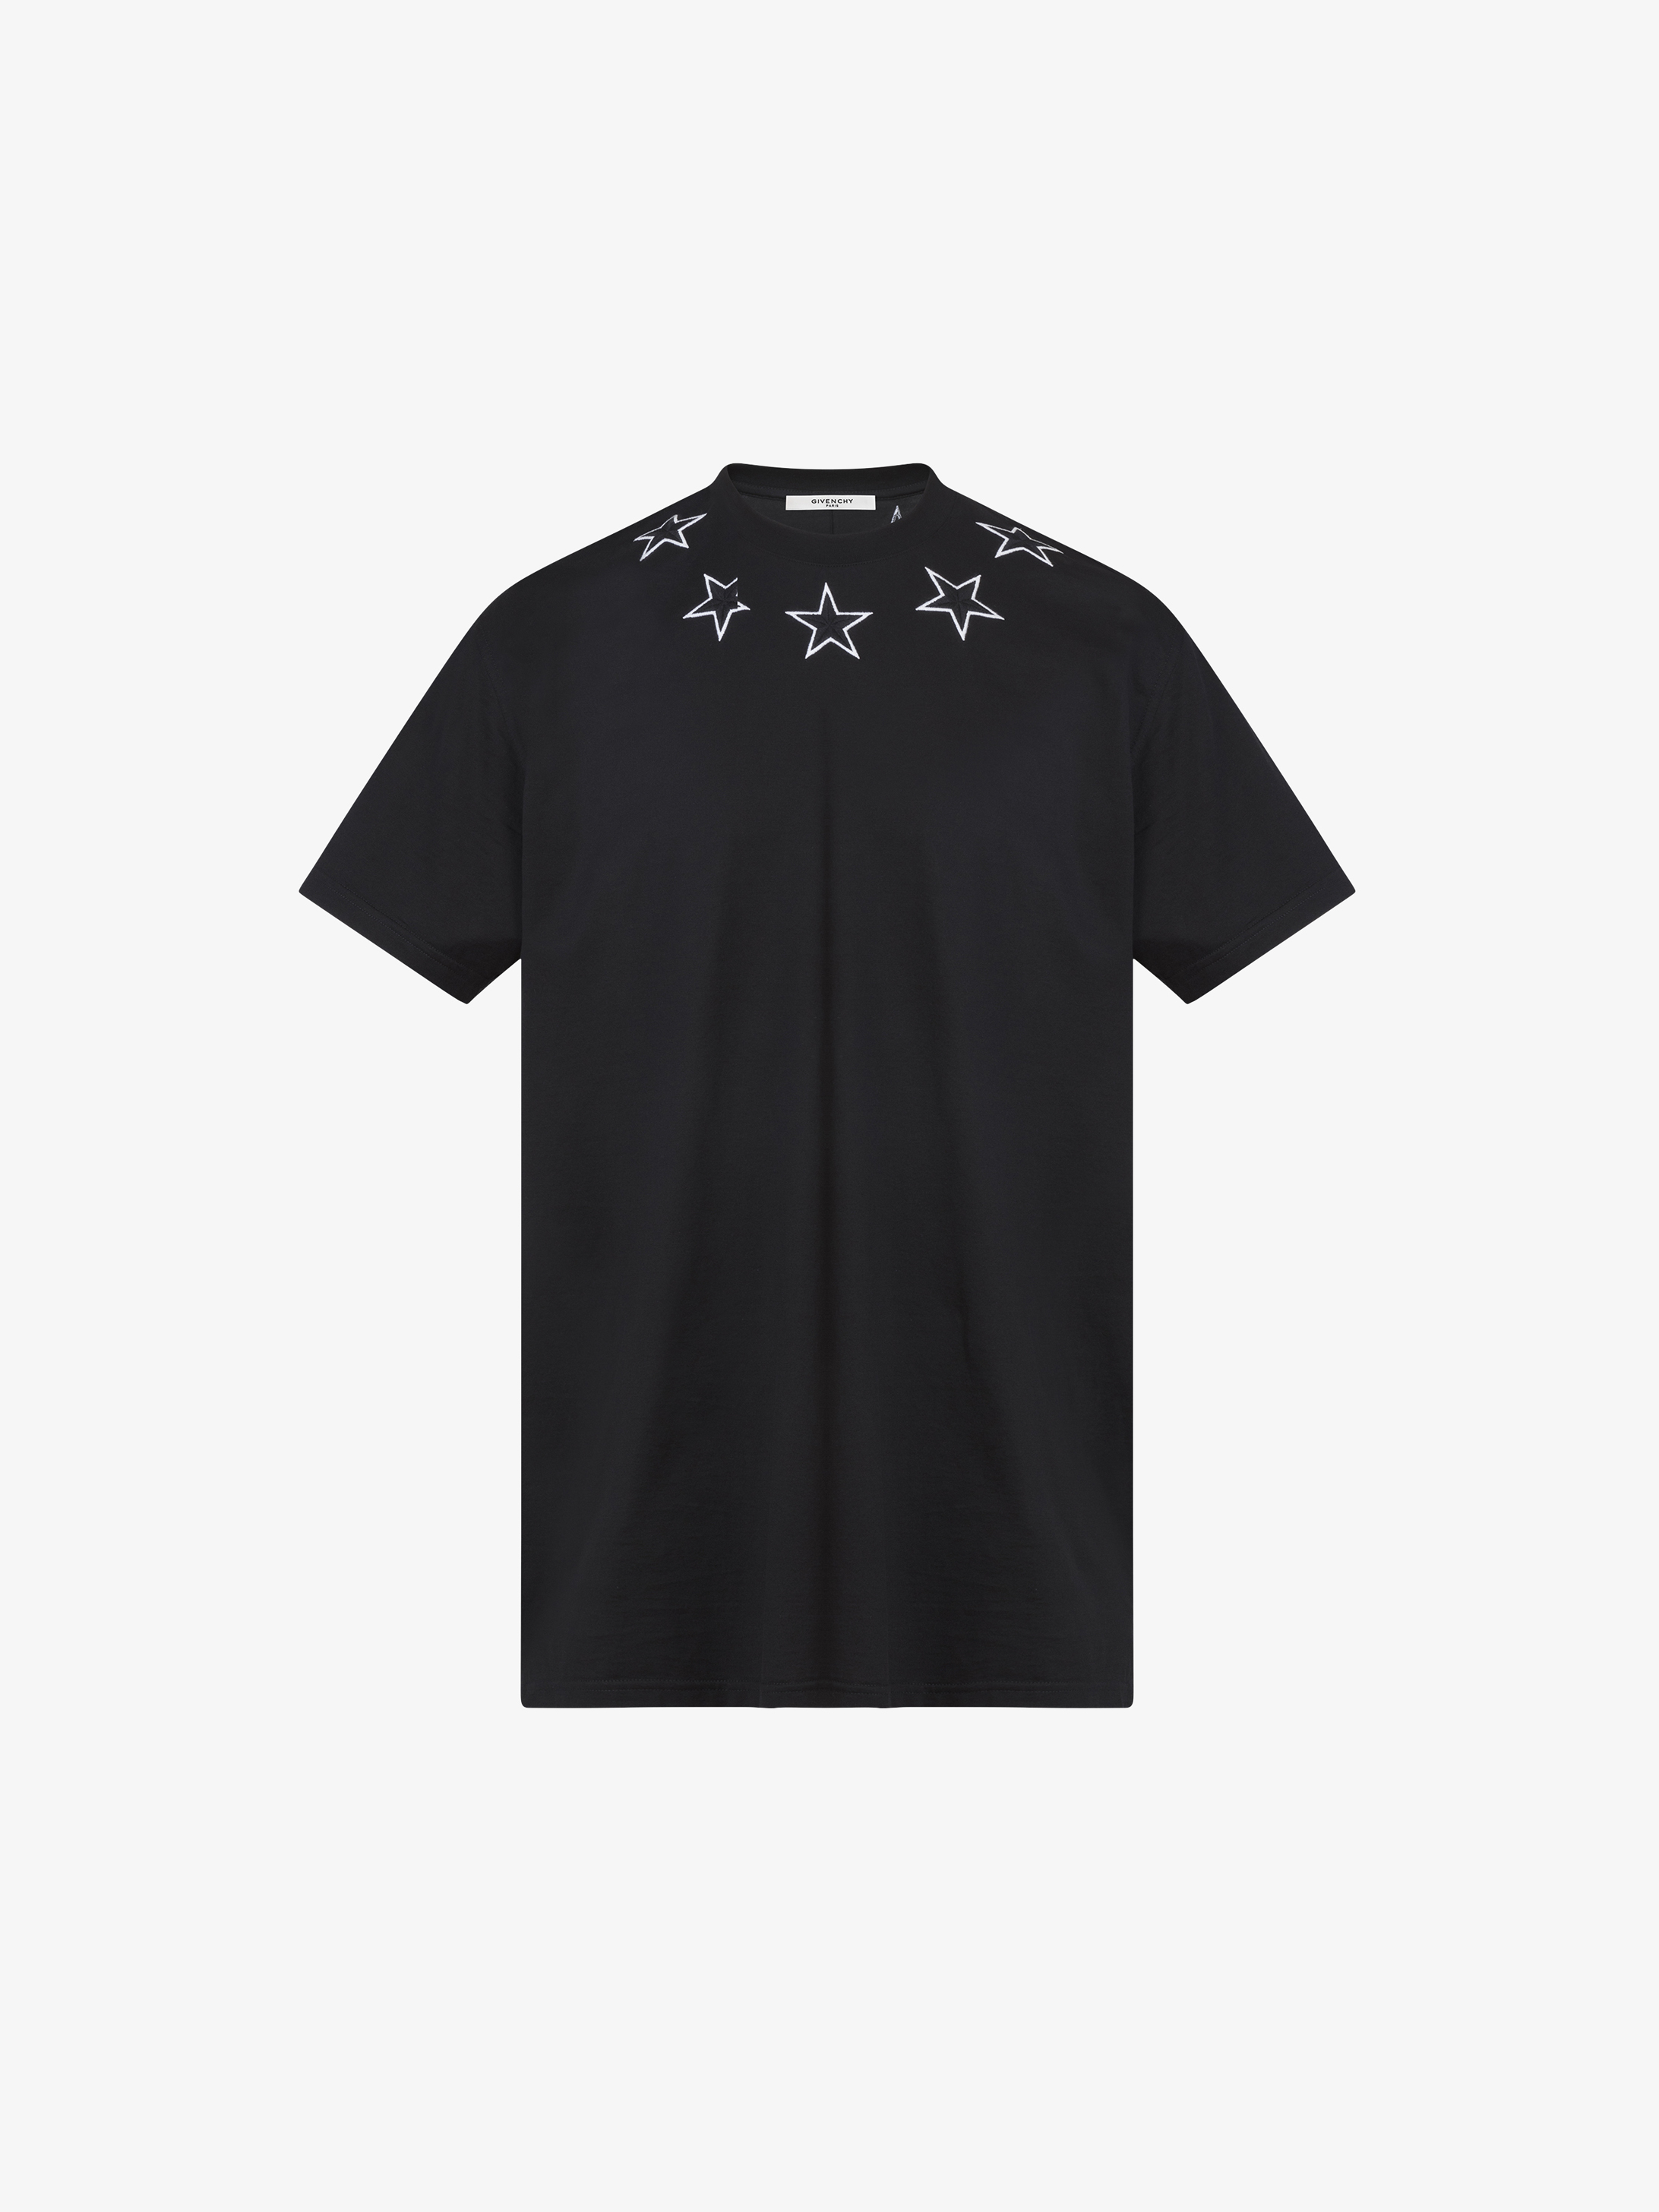 T-shirt oversized brodé etoiles